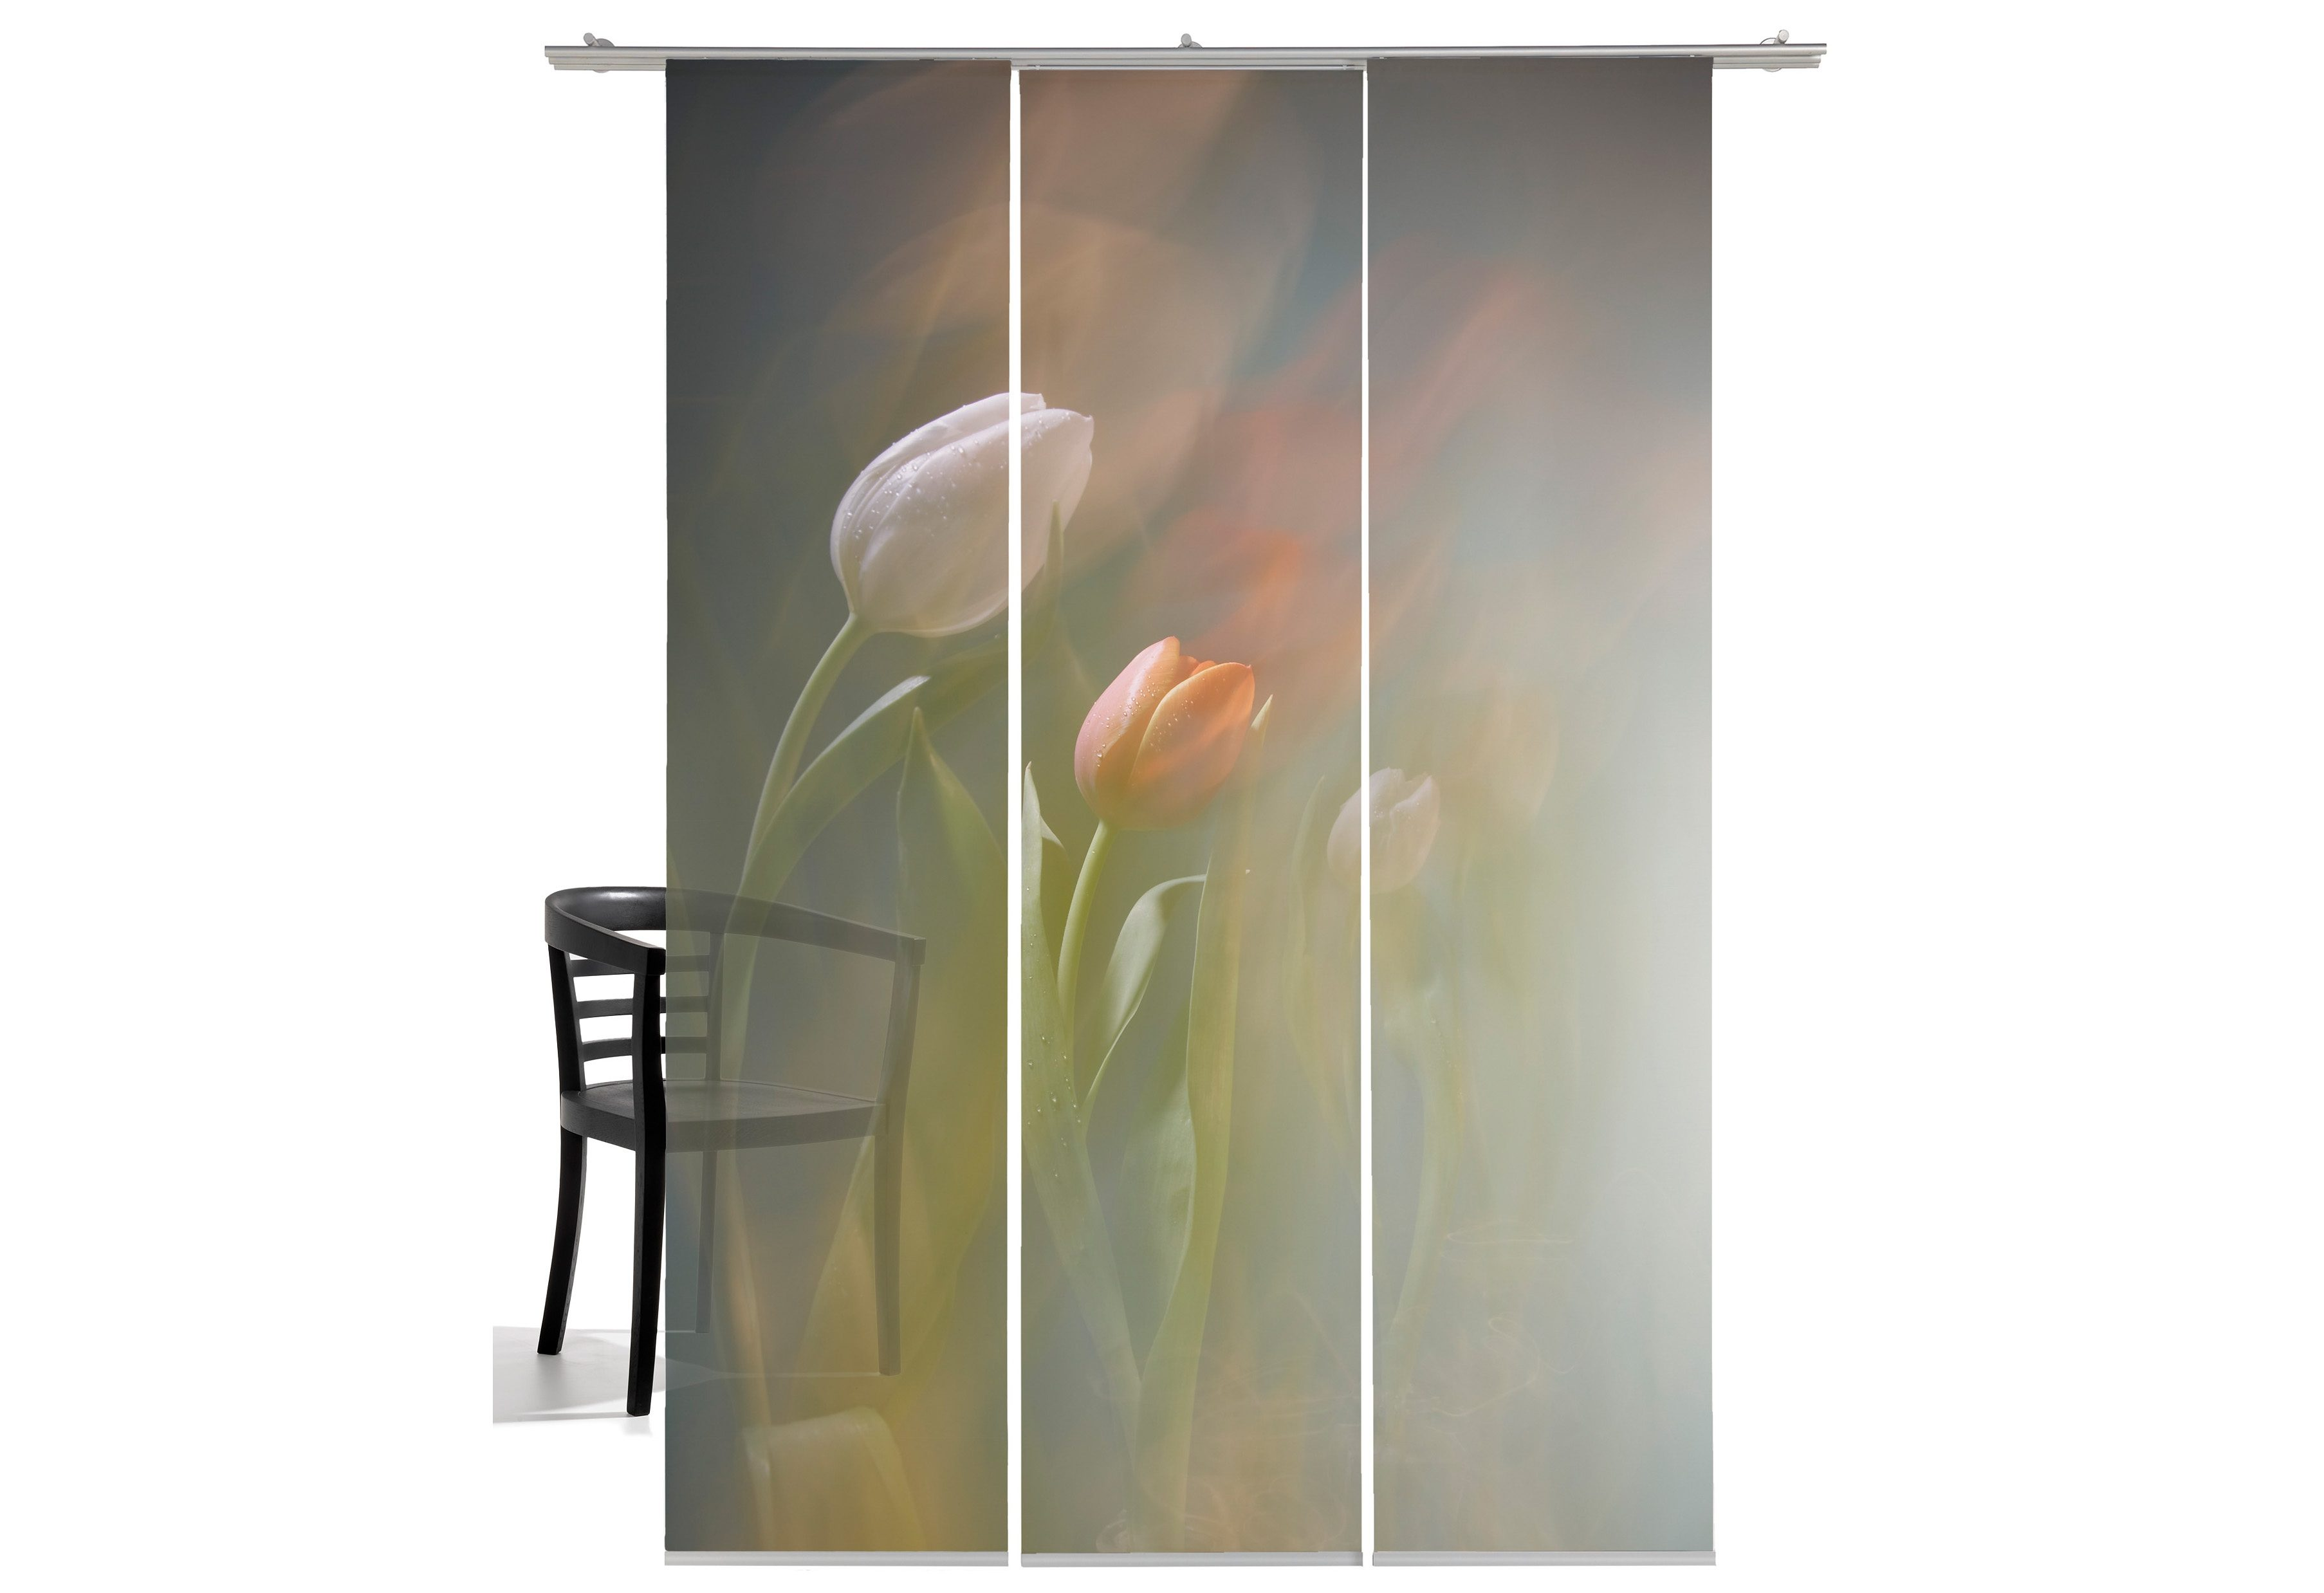 Schiebegardine »Tulpen«, emotion textiles, Klettband (3 Stück), inkl. Beschwerungsstange